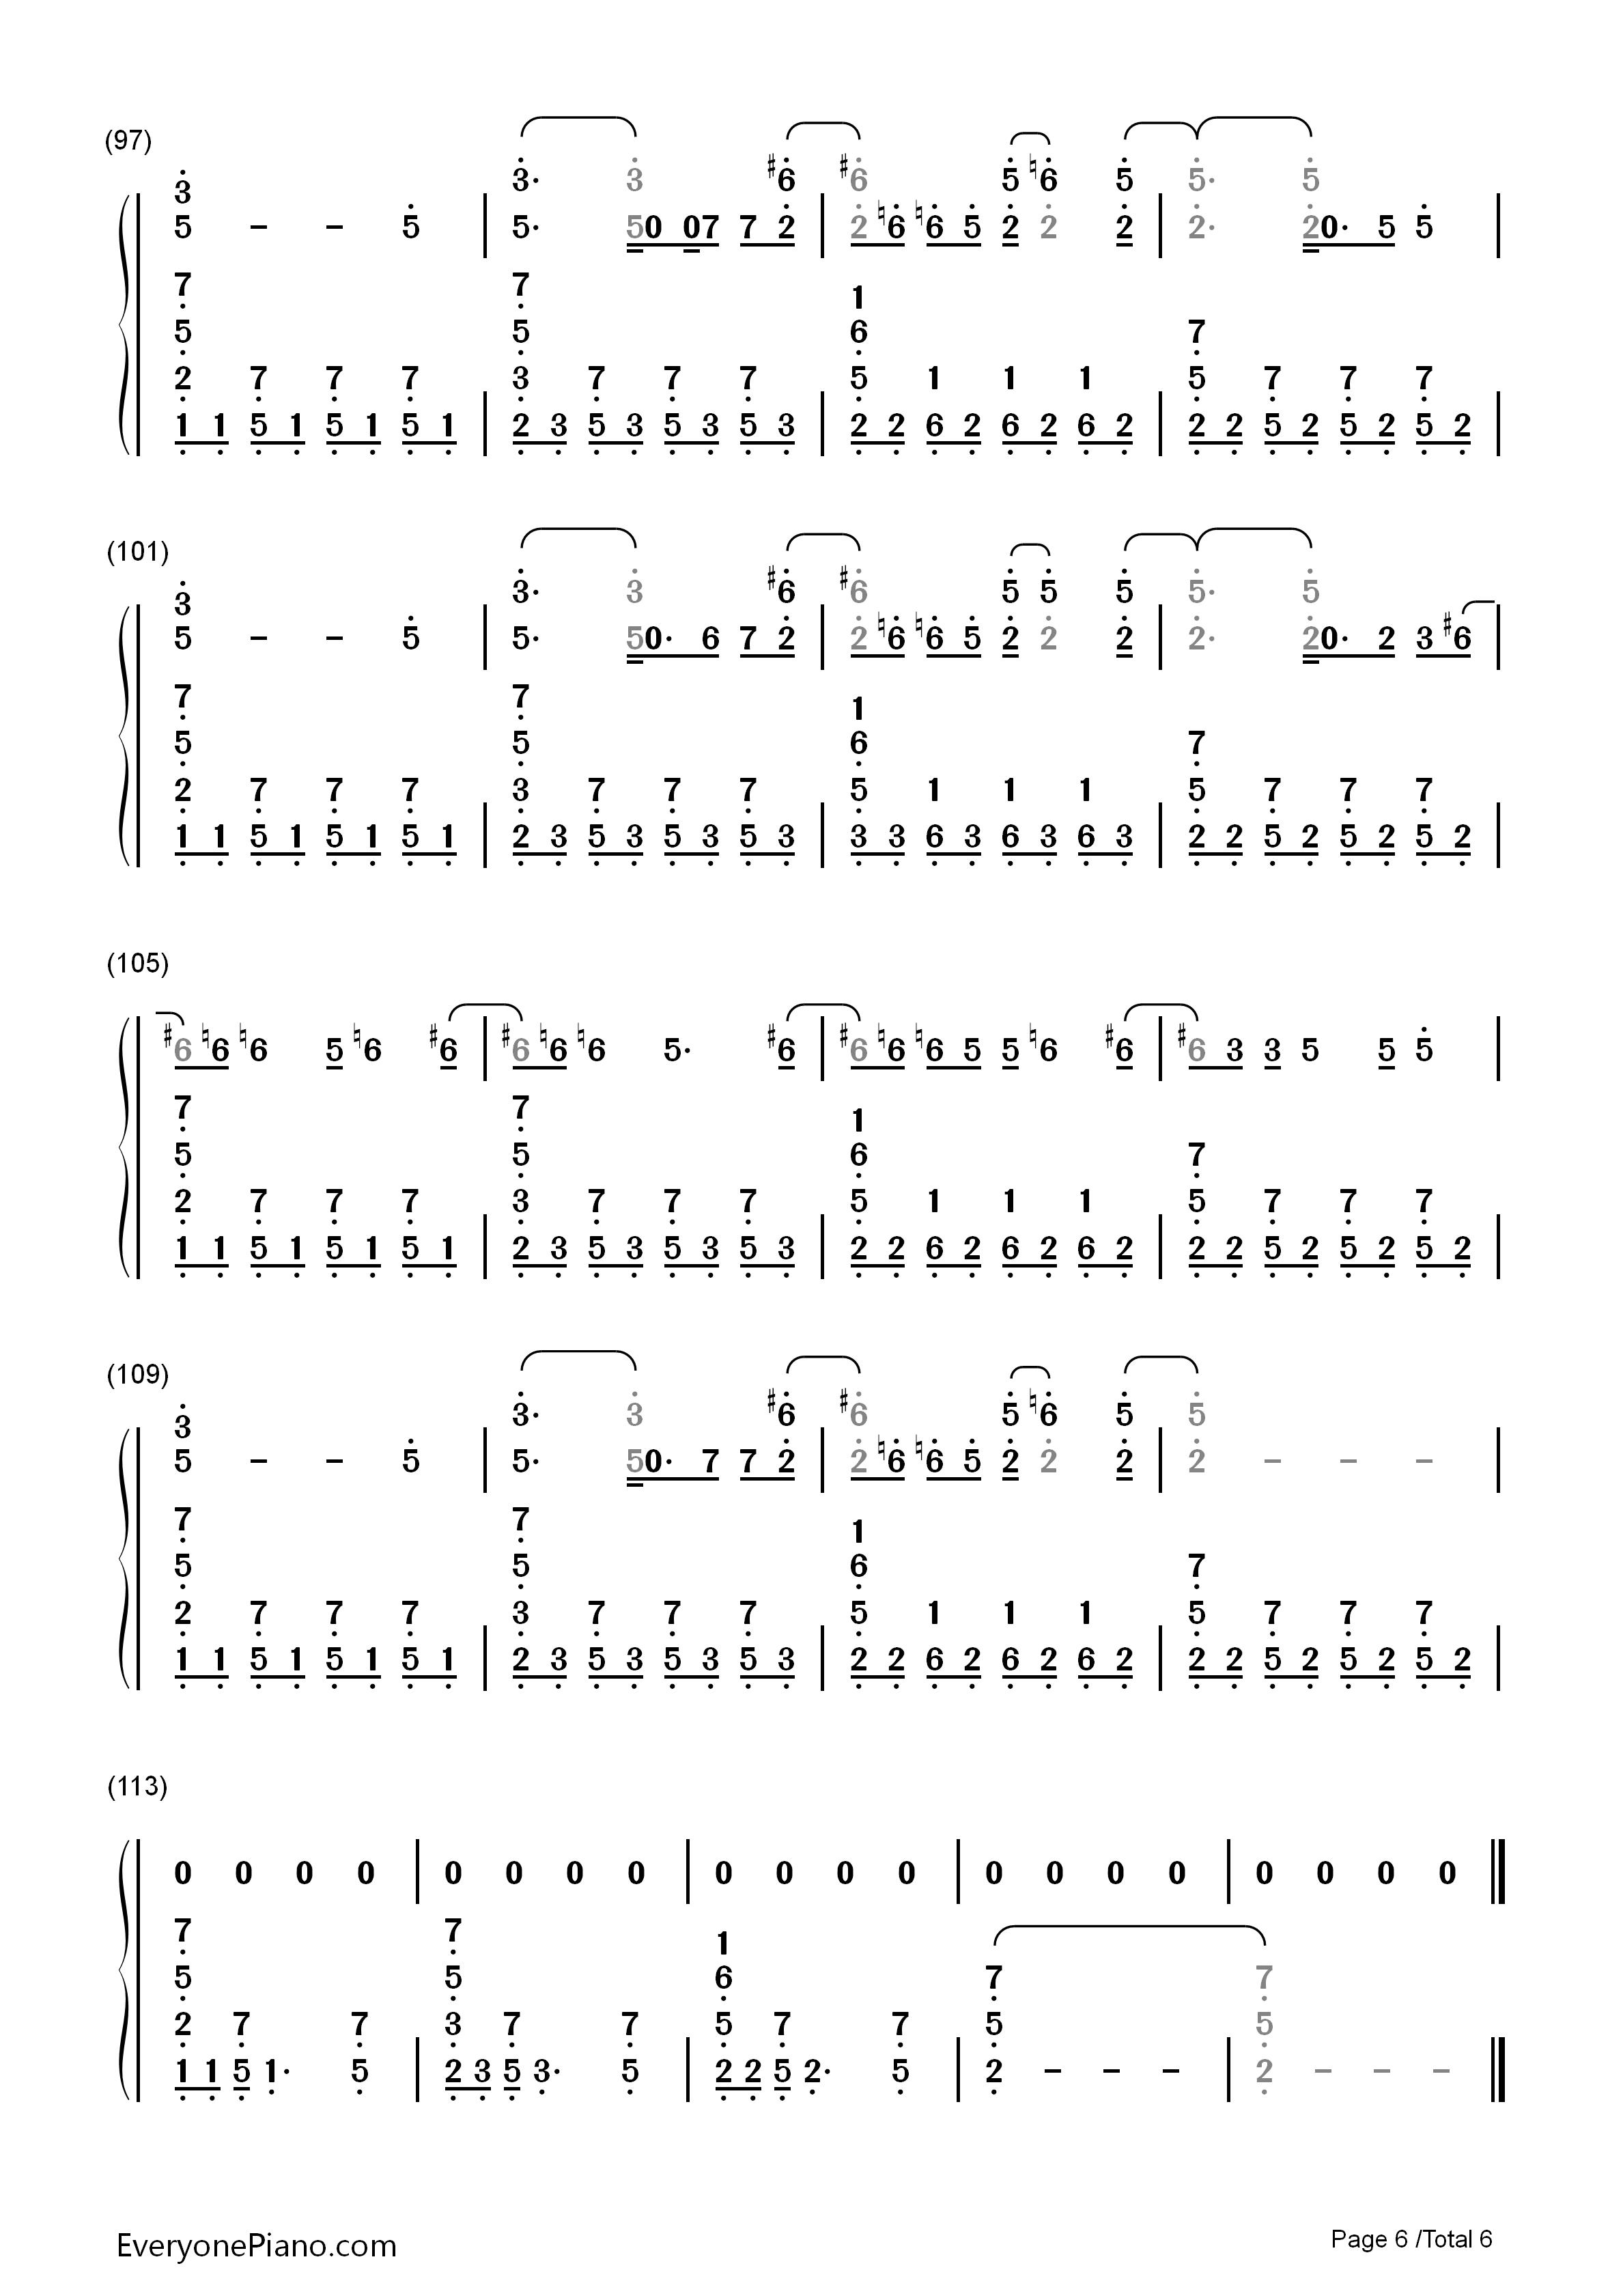 aroon 5双手简谱预览6 钢琴谱档 五线谱 双手简谱 数位谱 Midi PDF